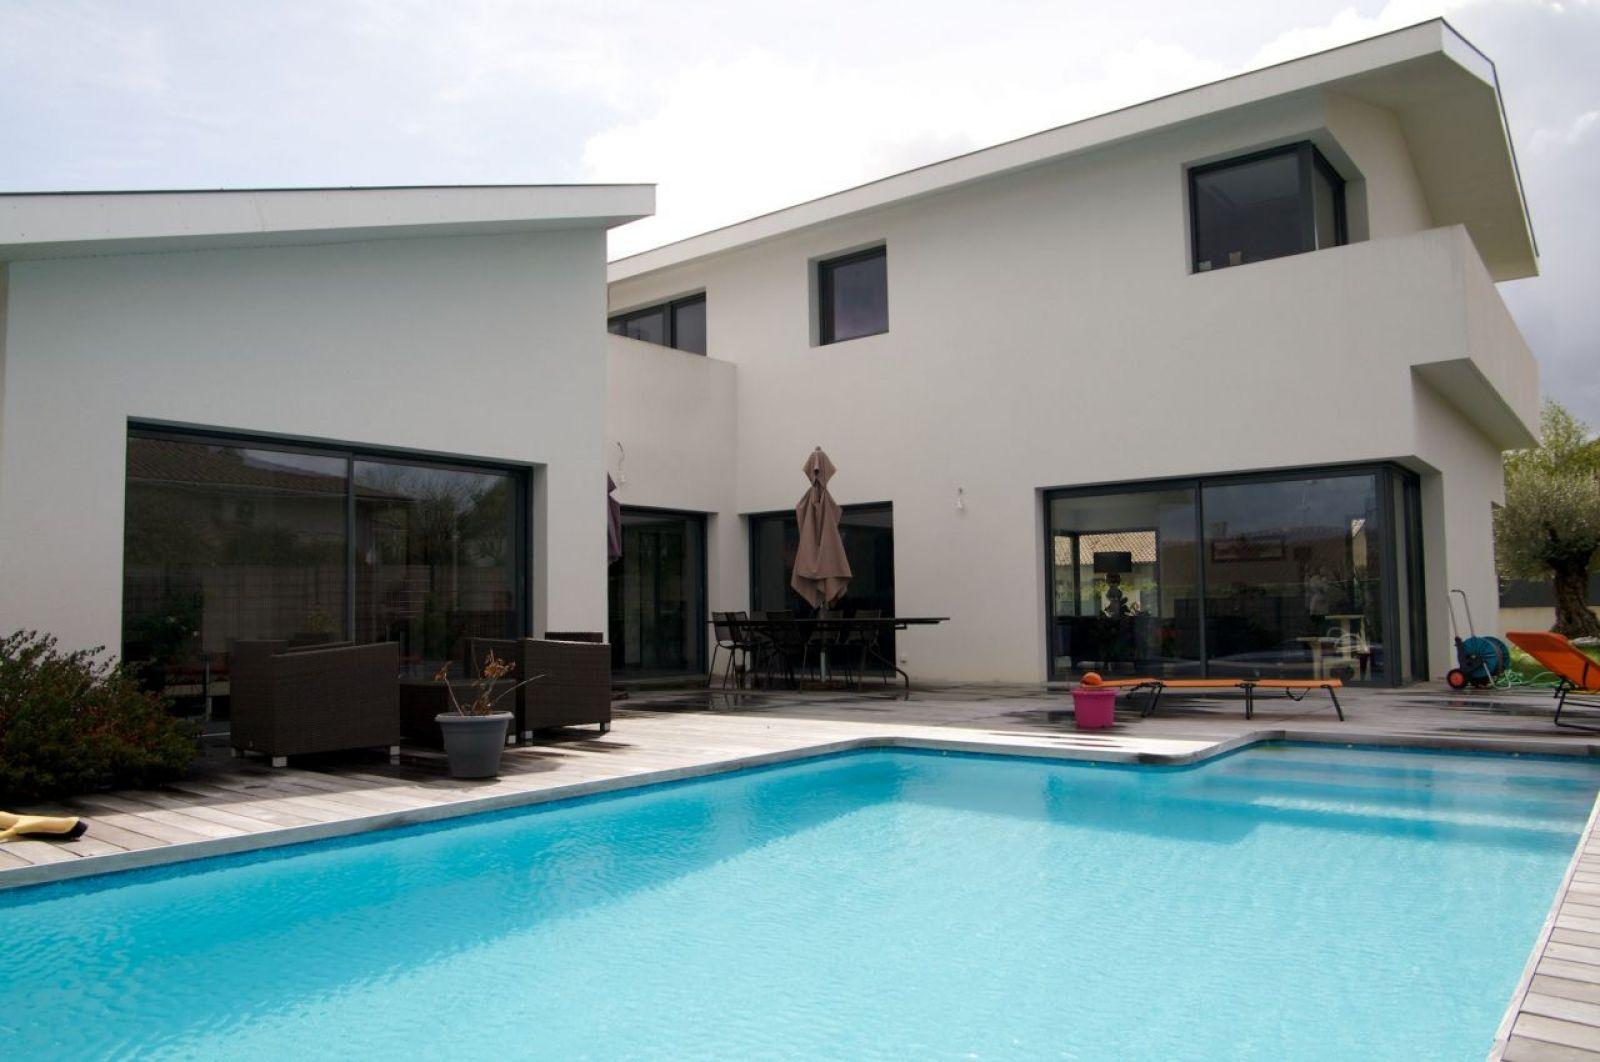 Awesome Maison Moderne Bordeaux Ideas - House Interior ...